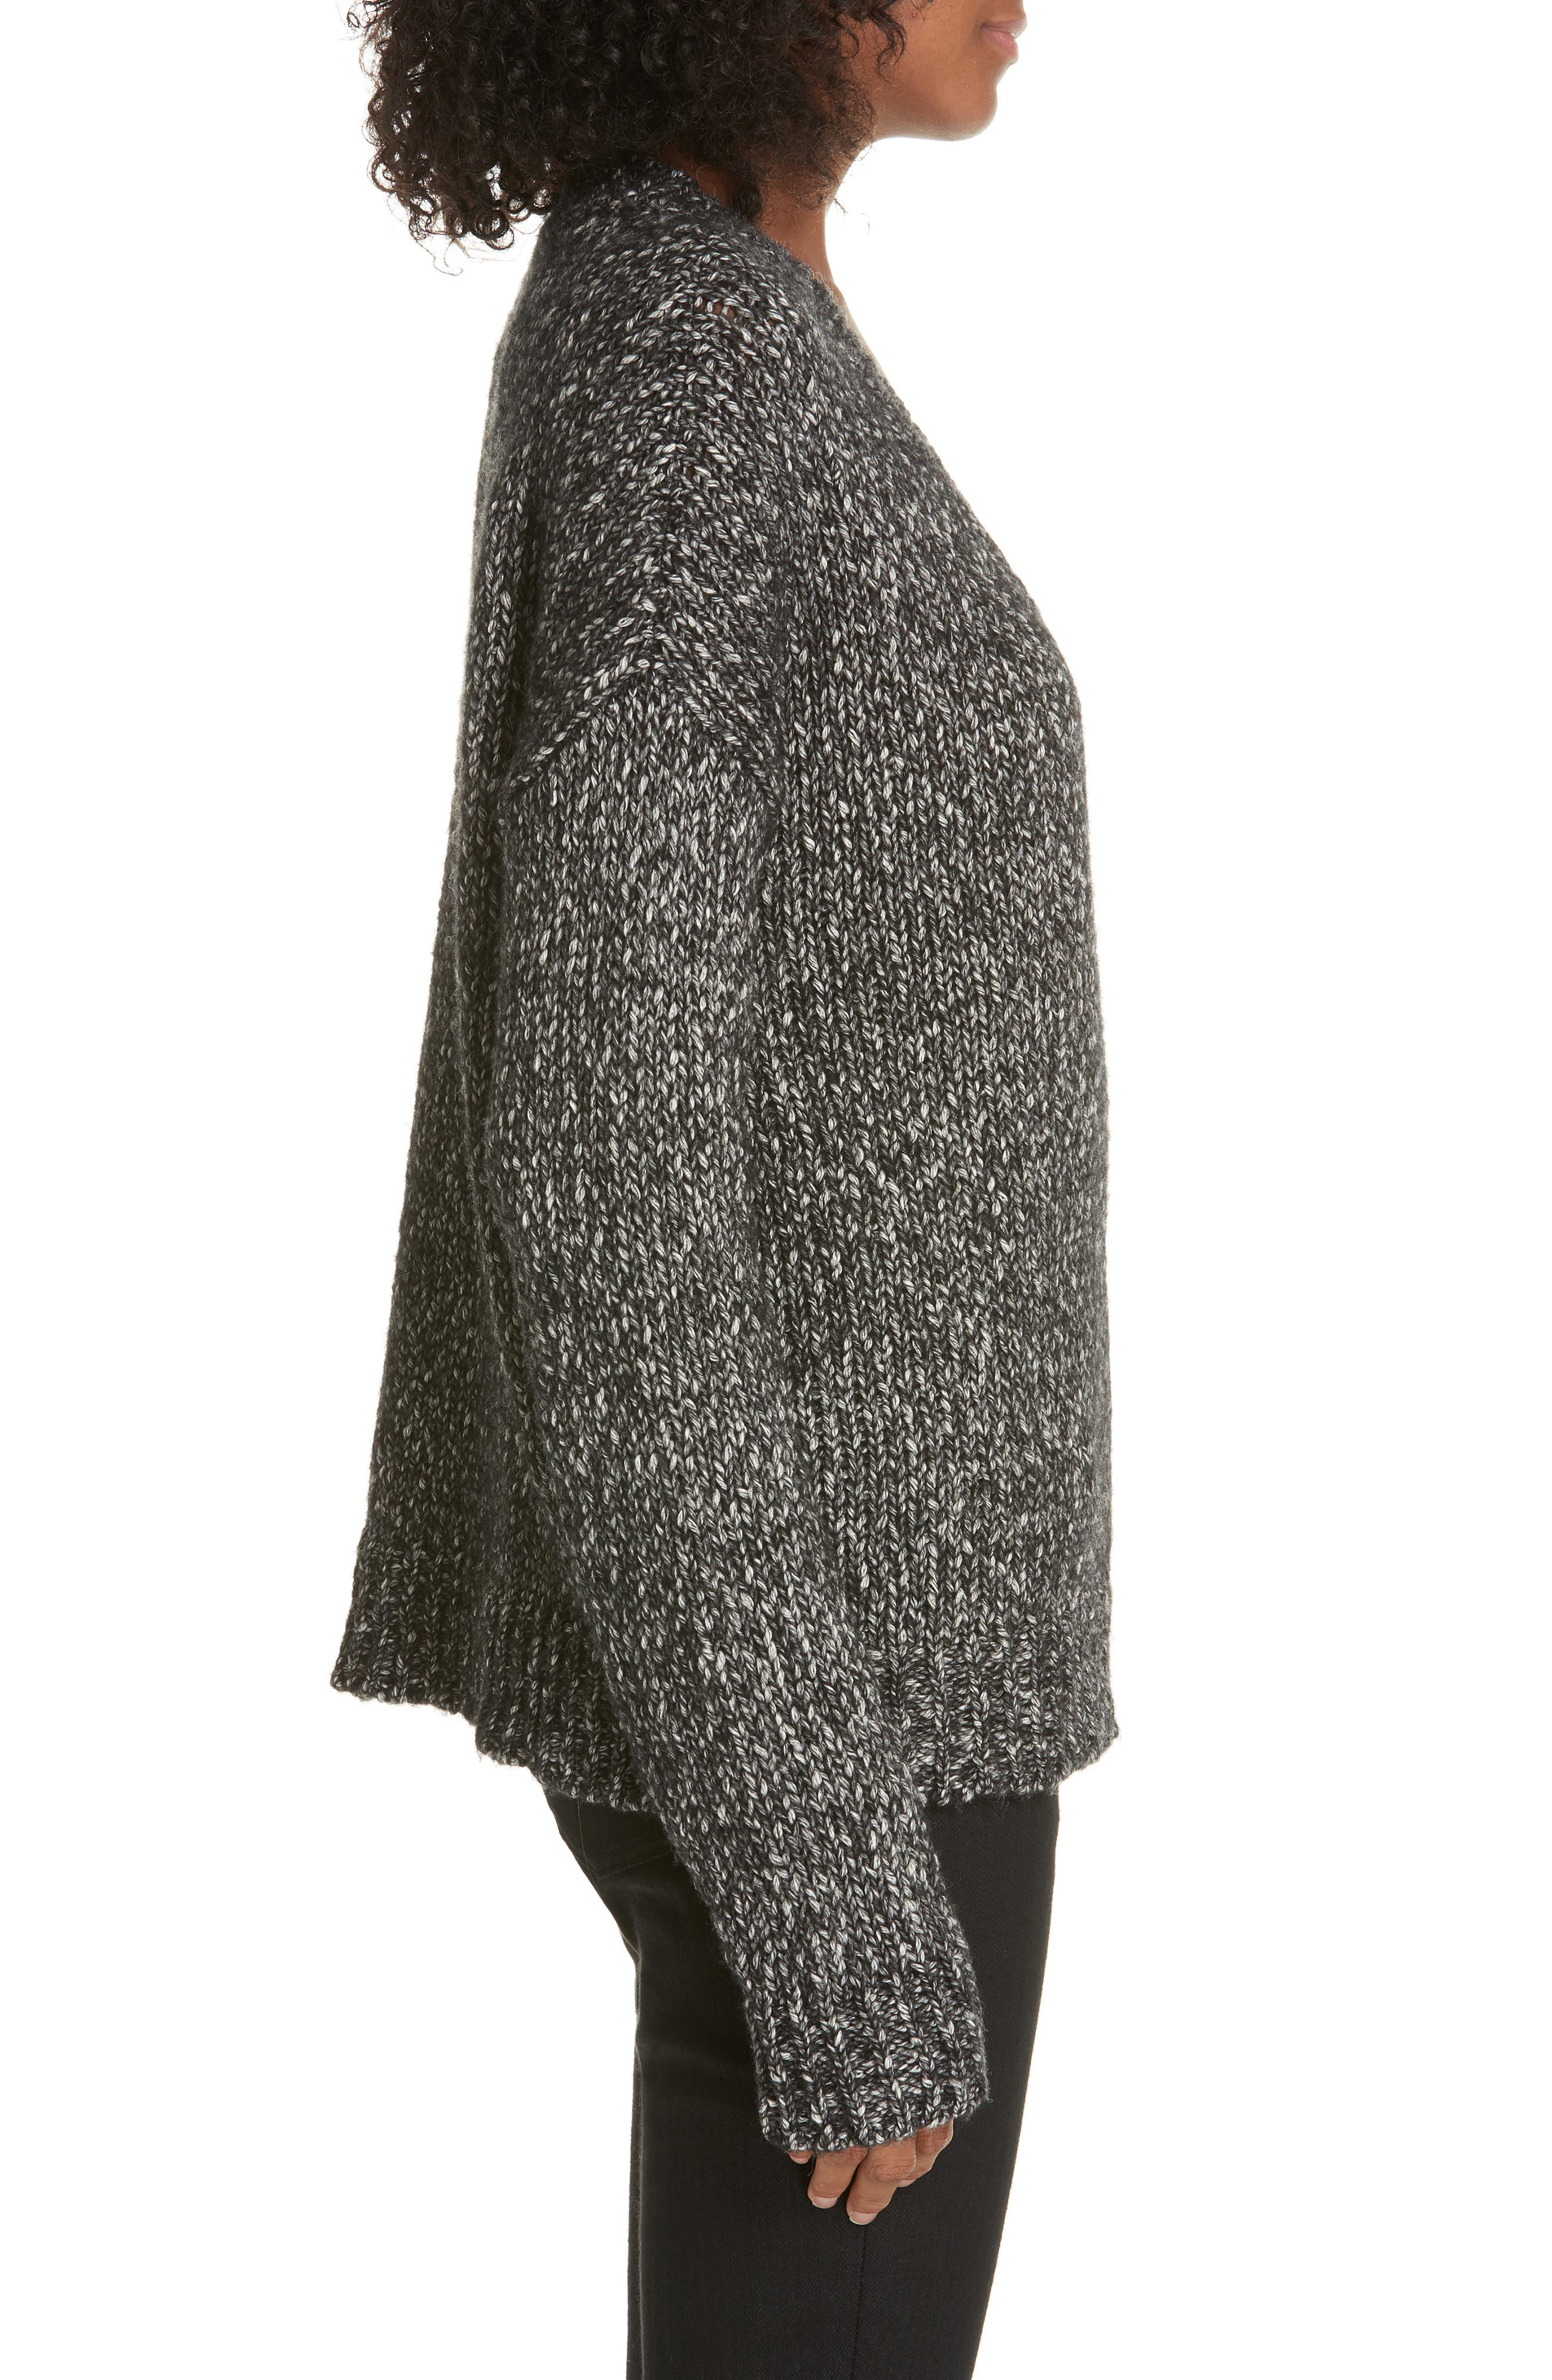 Parkland Slouchy Cotton & Wool Sweater,                             Alternate thumbnail 3, color,                             LEAD MELANGE